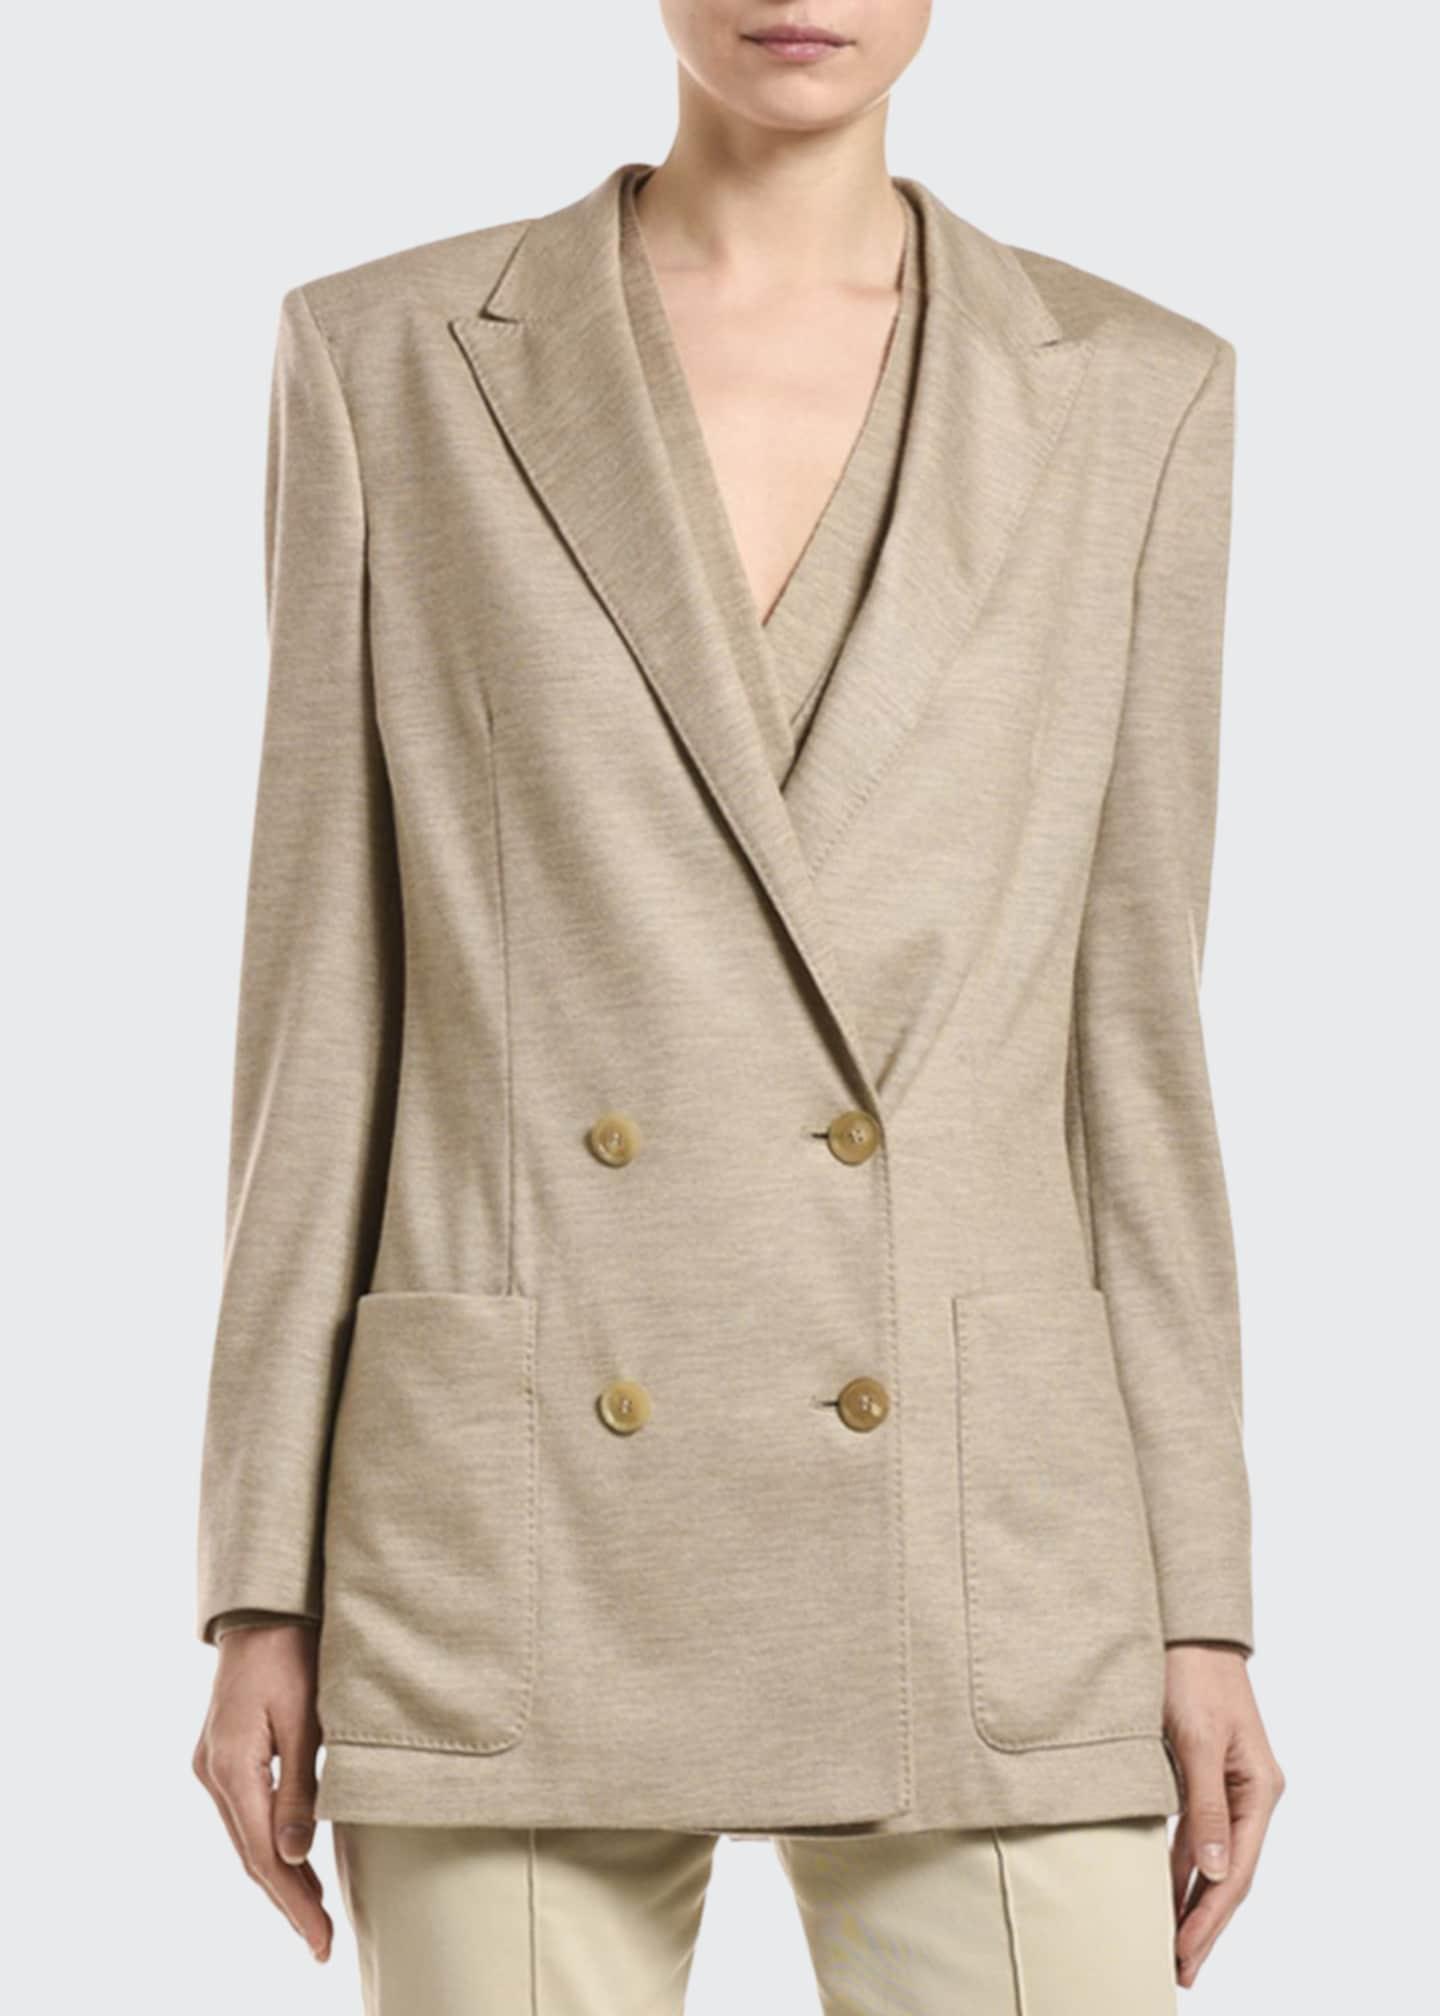 Agnona Cashmere Pique Double-Breasted Jacket